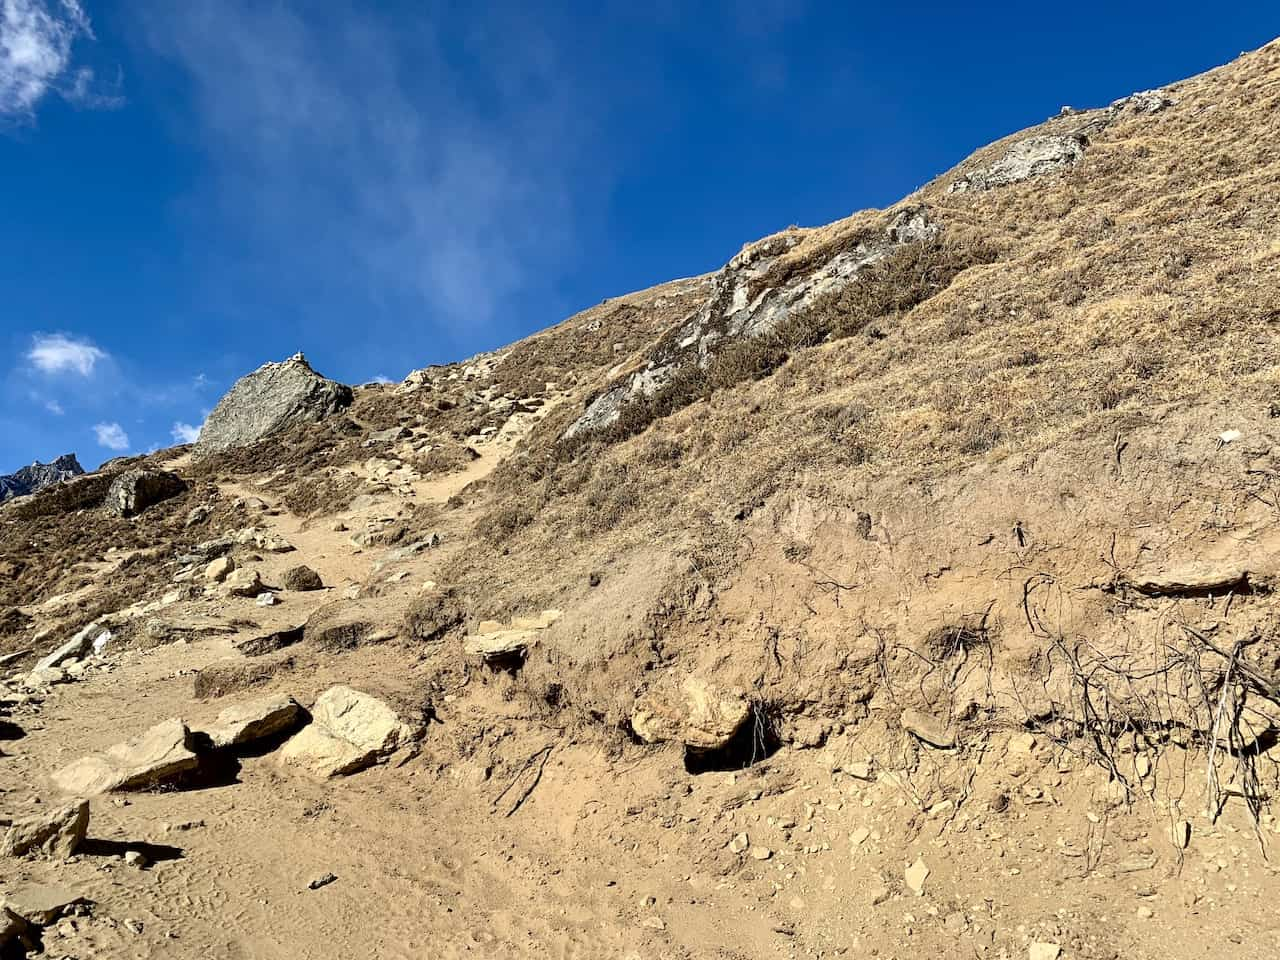 Gokyo Ri Trekking Route